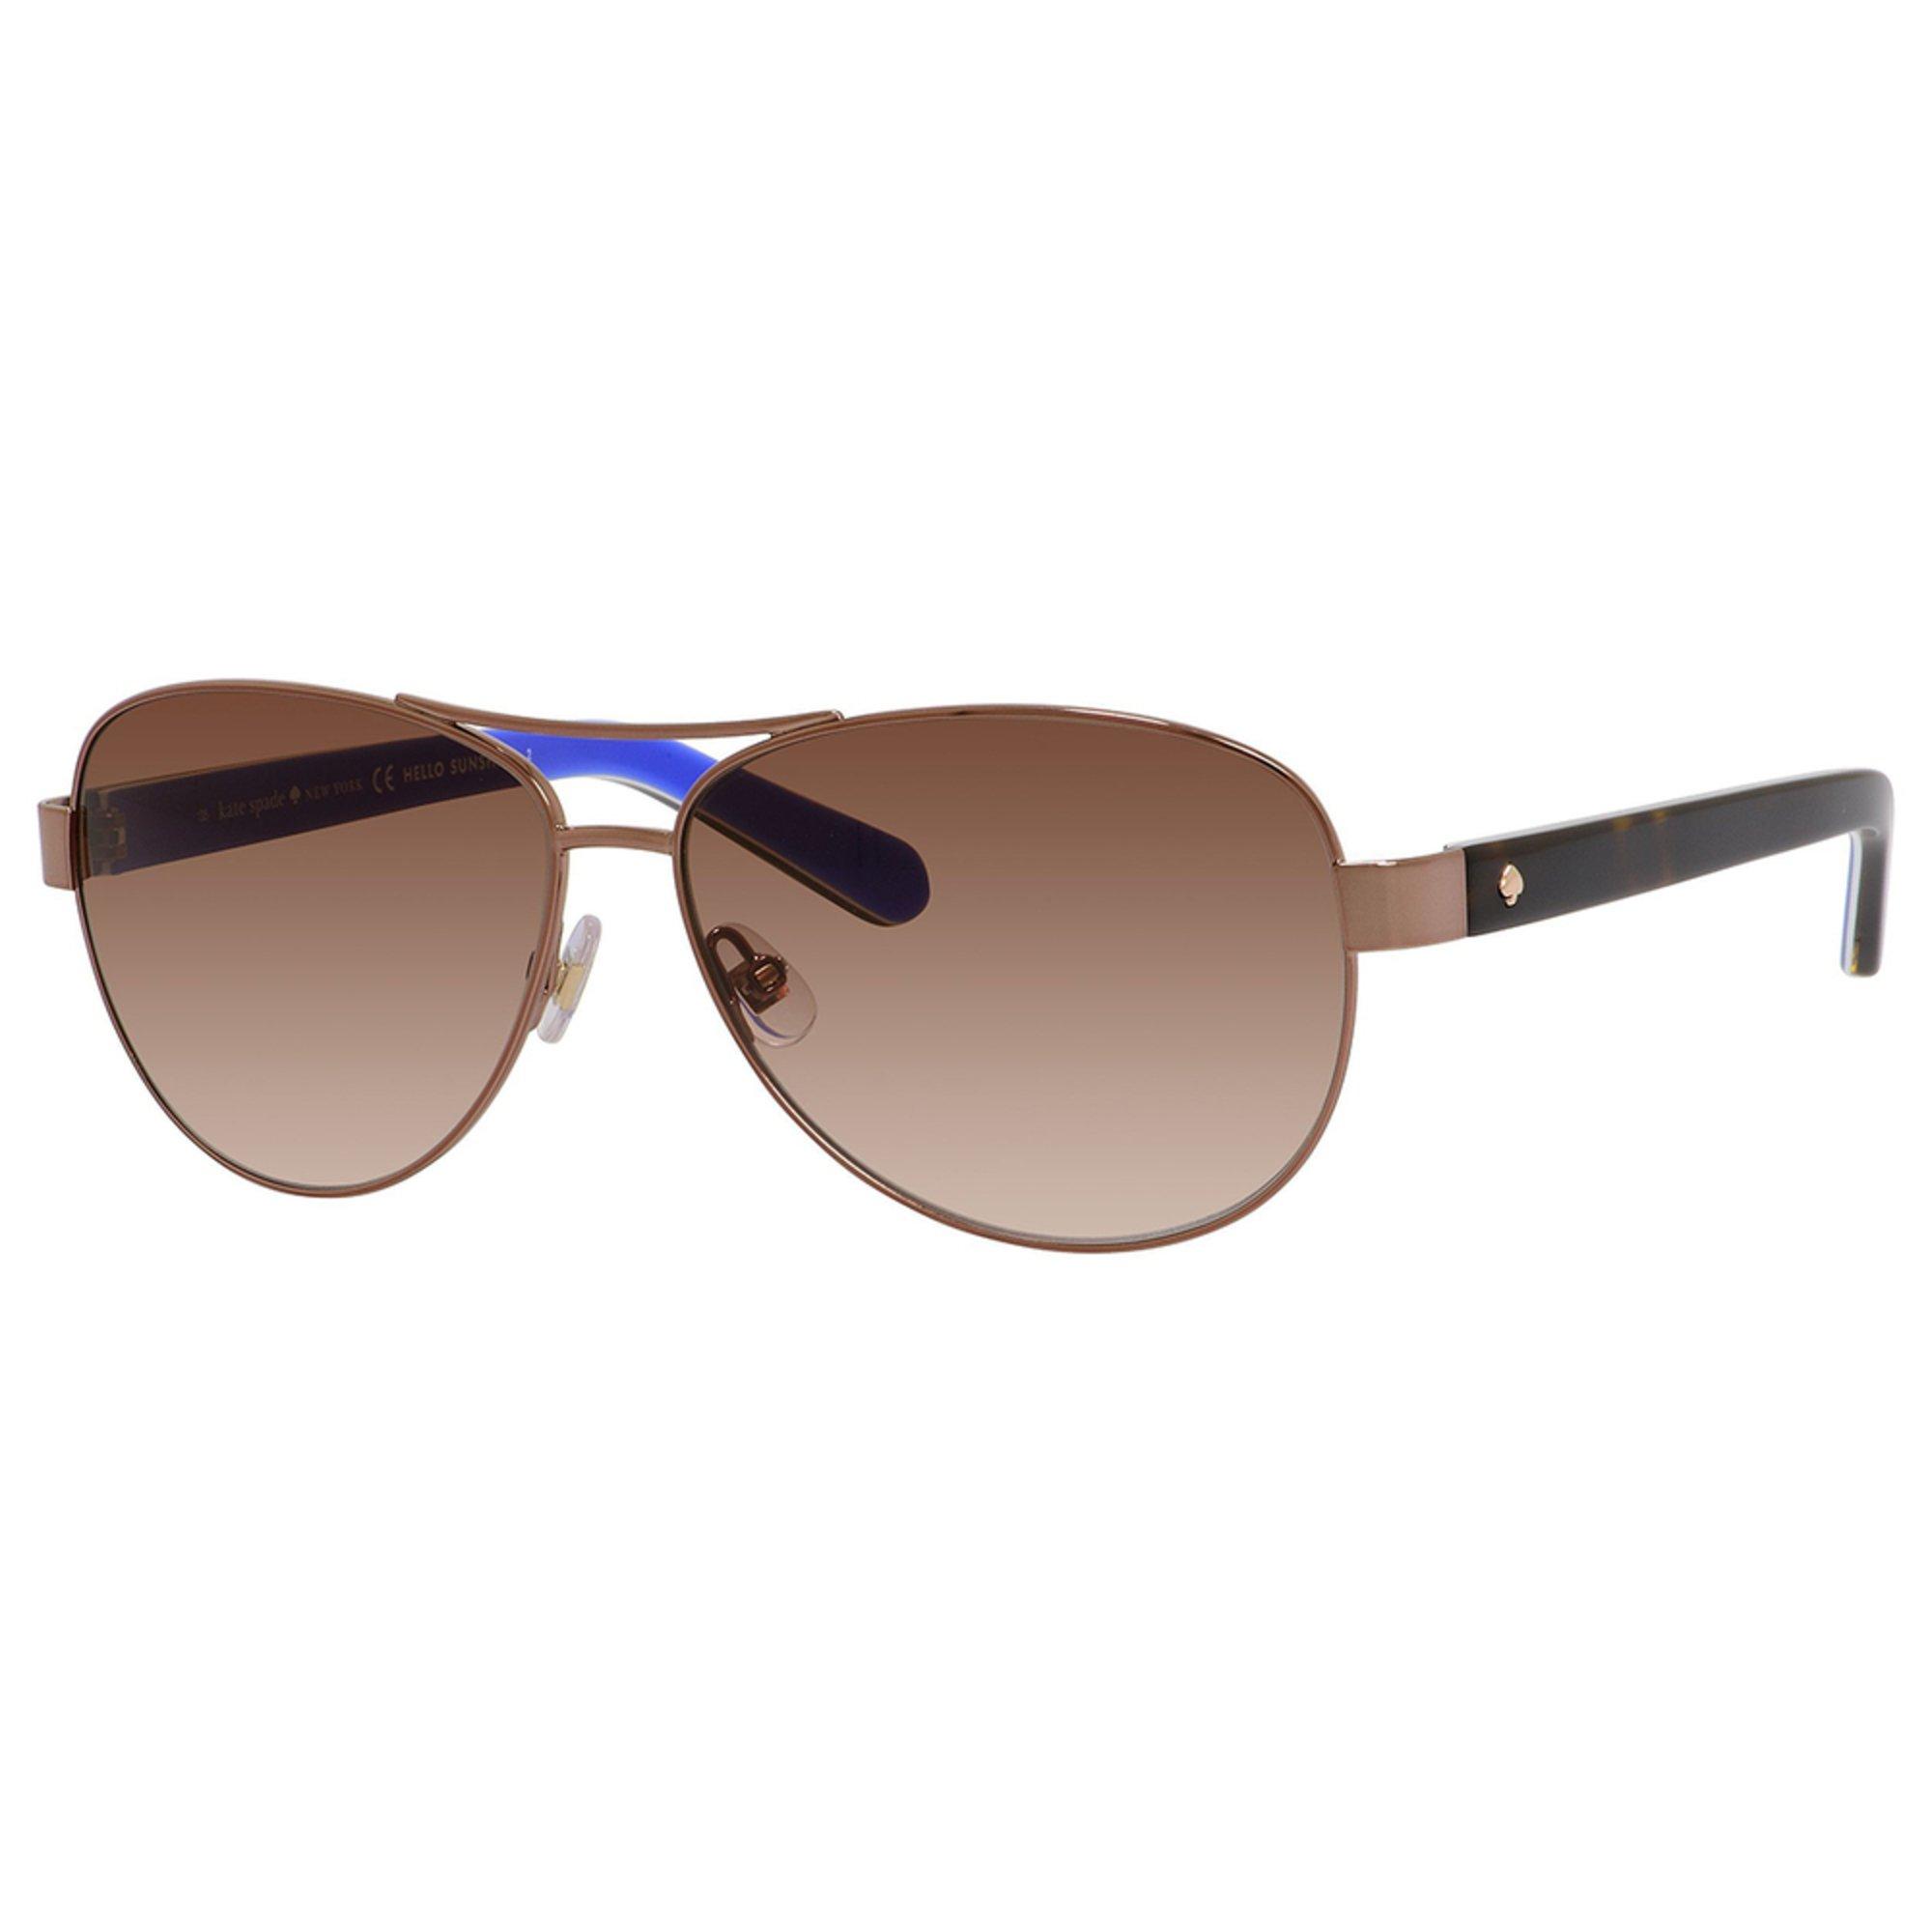 d5146a4e55b Kate Spade New York. Kate Spade New York Women s Dalia 2 Aviator Sunglasses